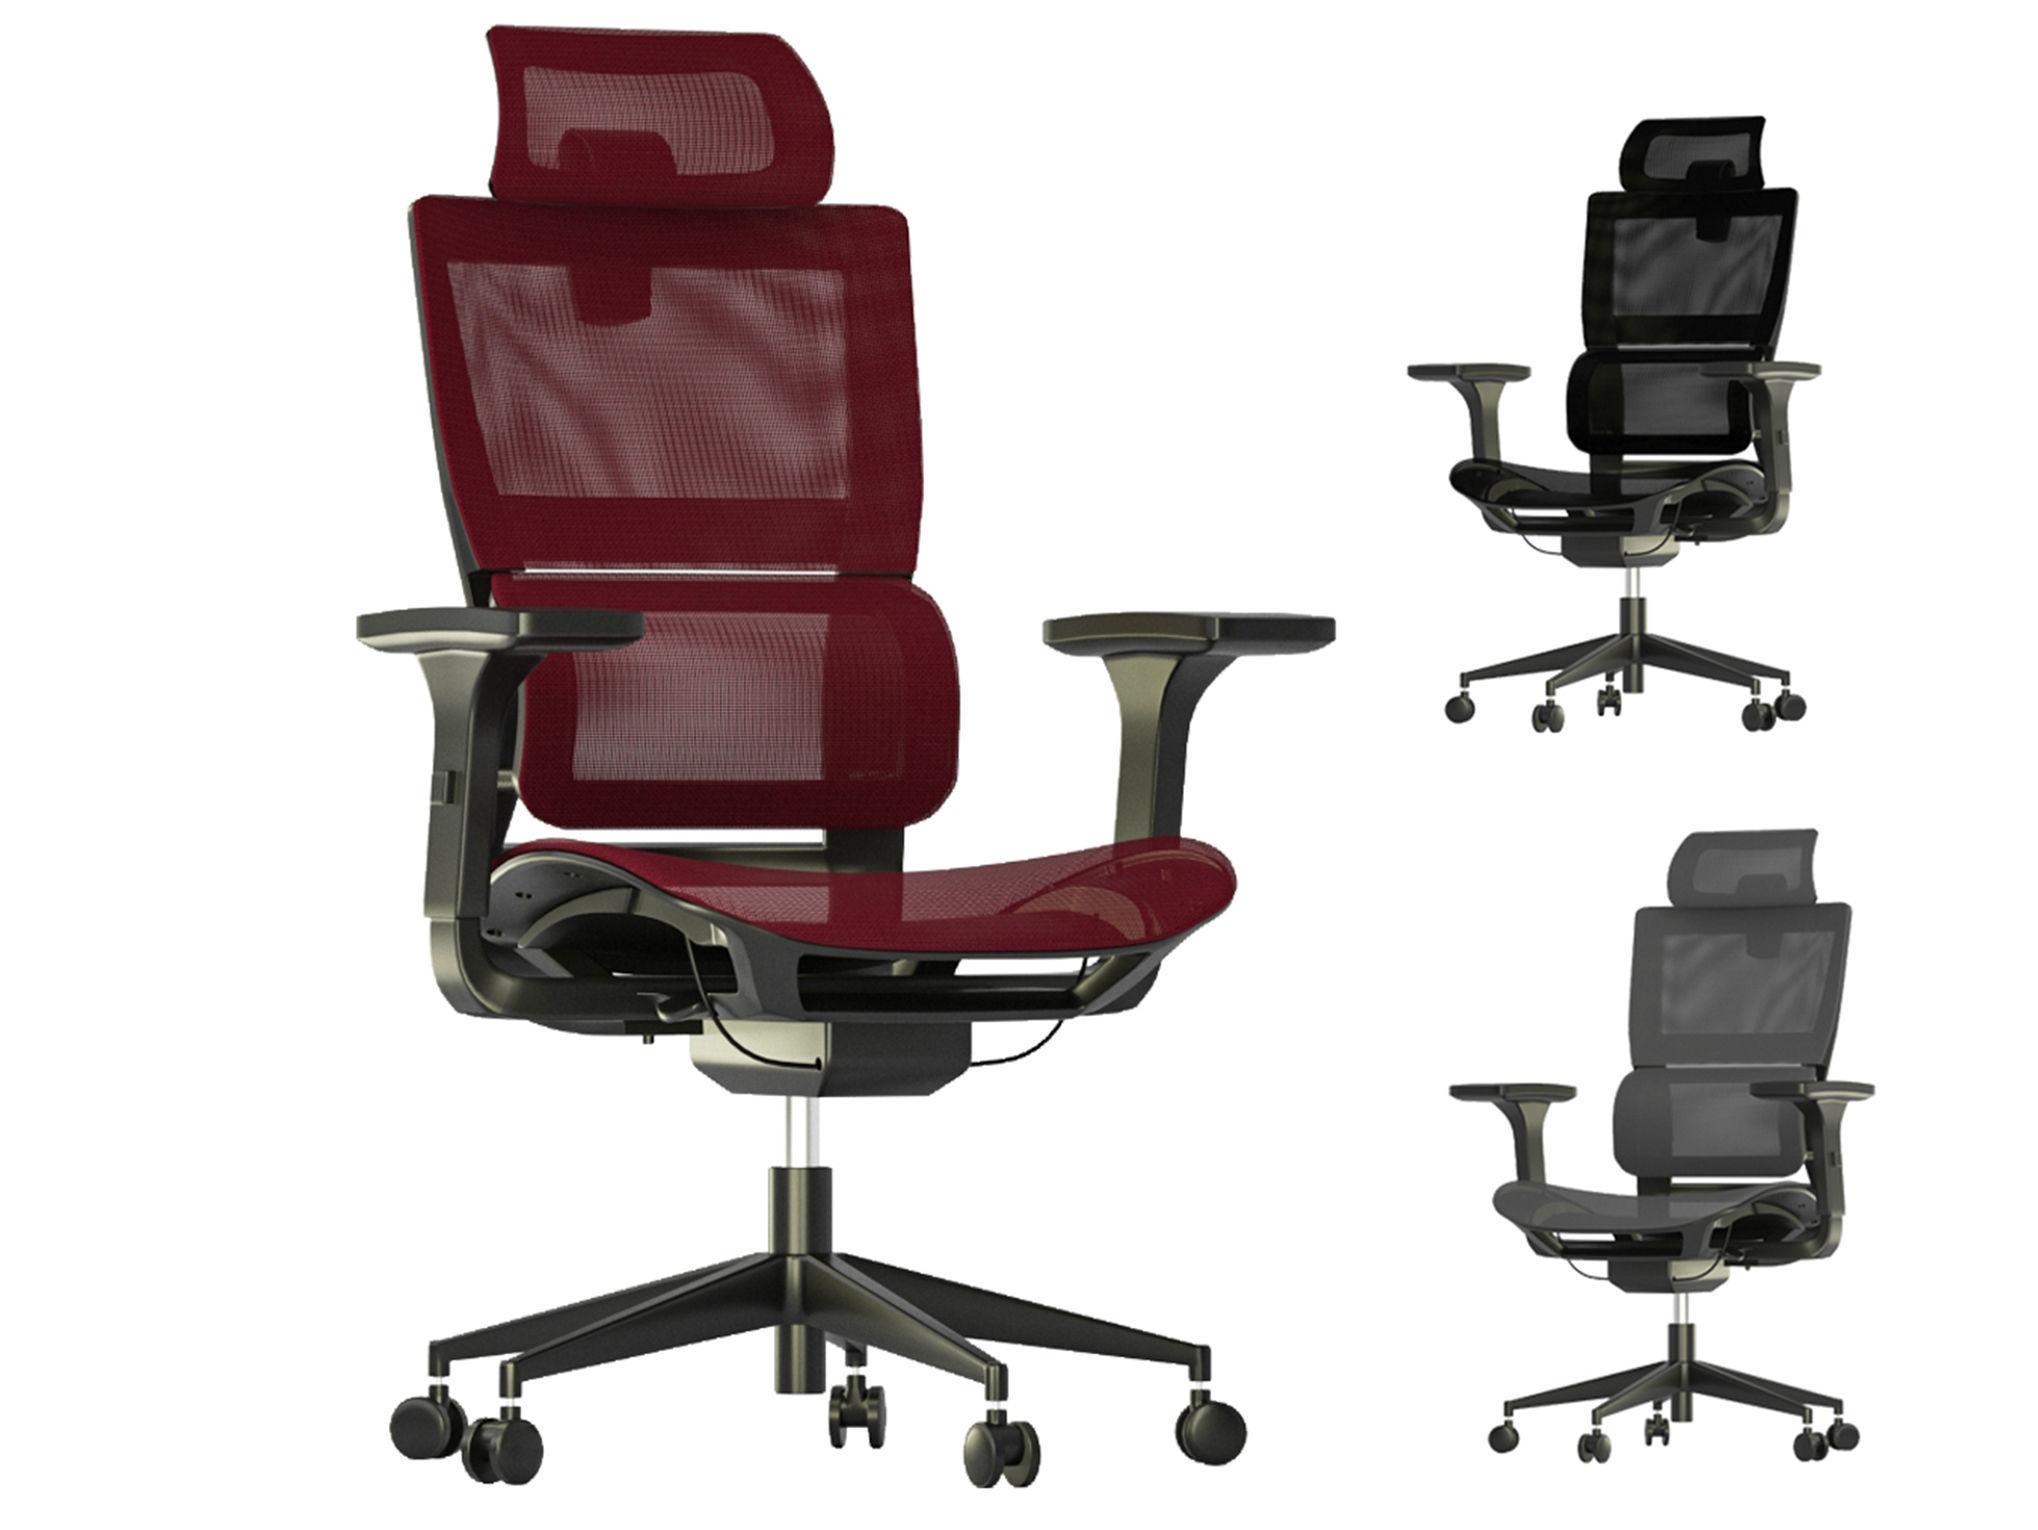 Innowin Capetown high back mesh office chair